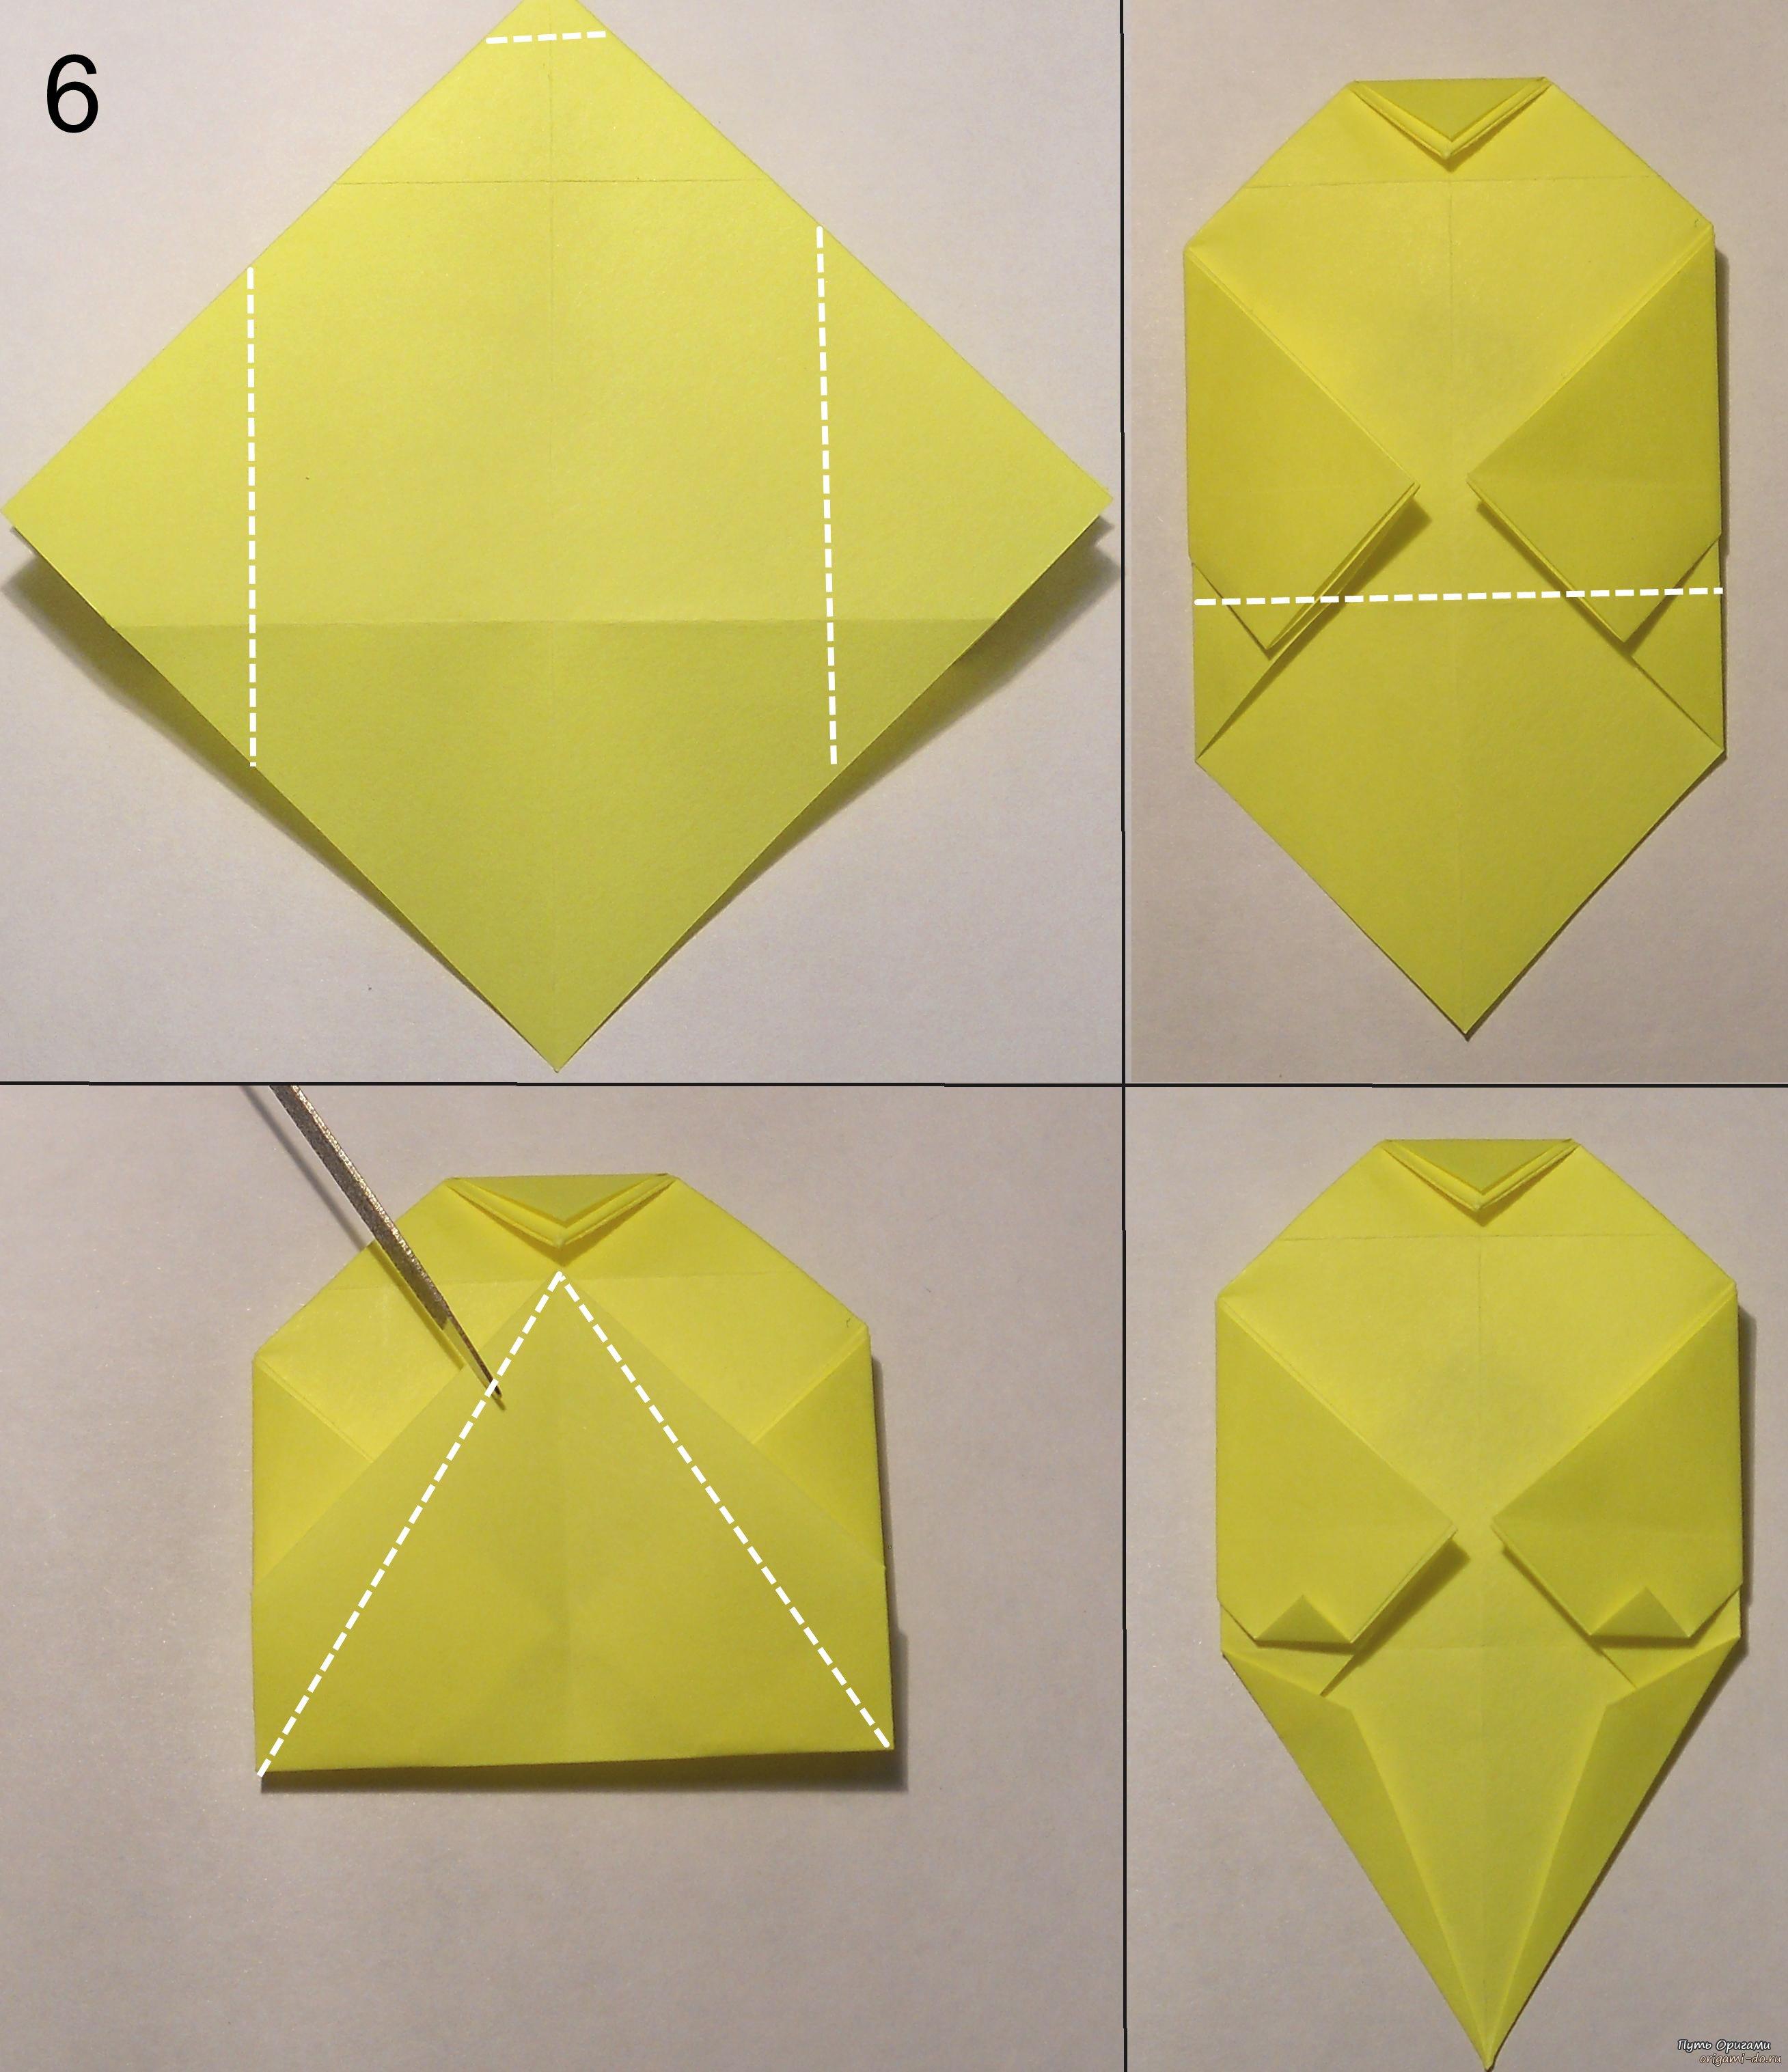 котёнок оригами схема 6.